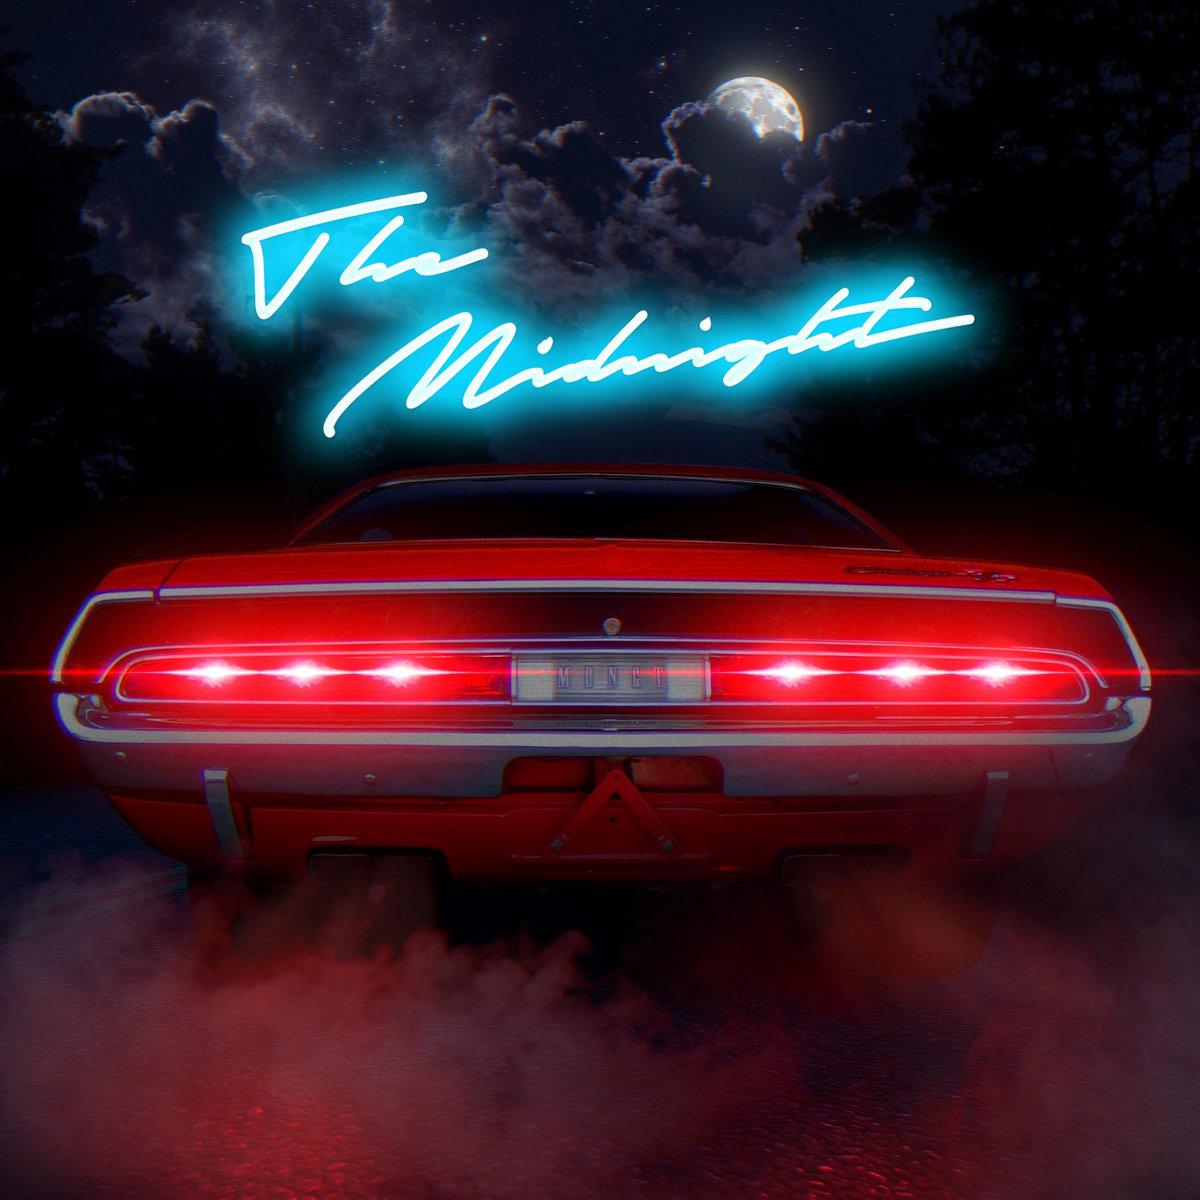 Days of Thunder | The Midnight